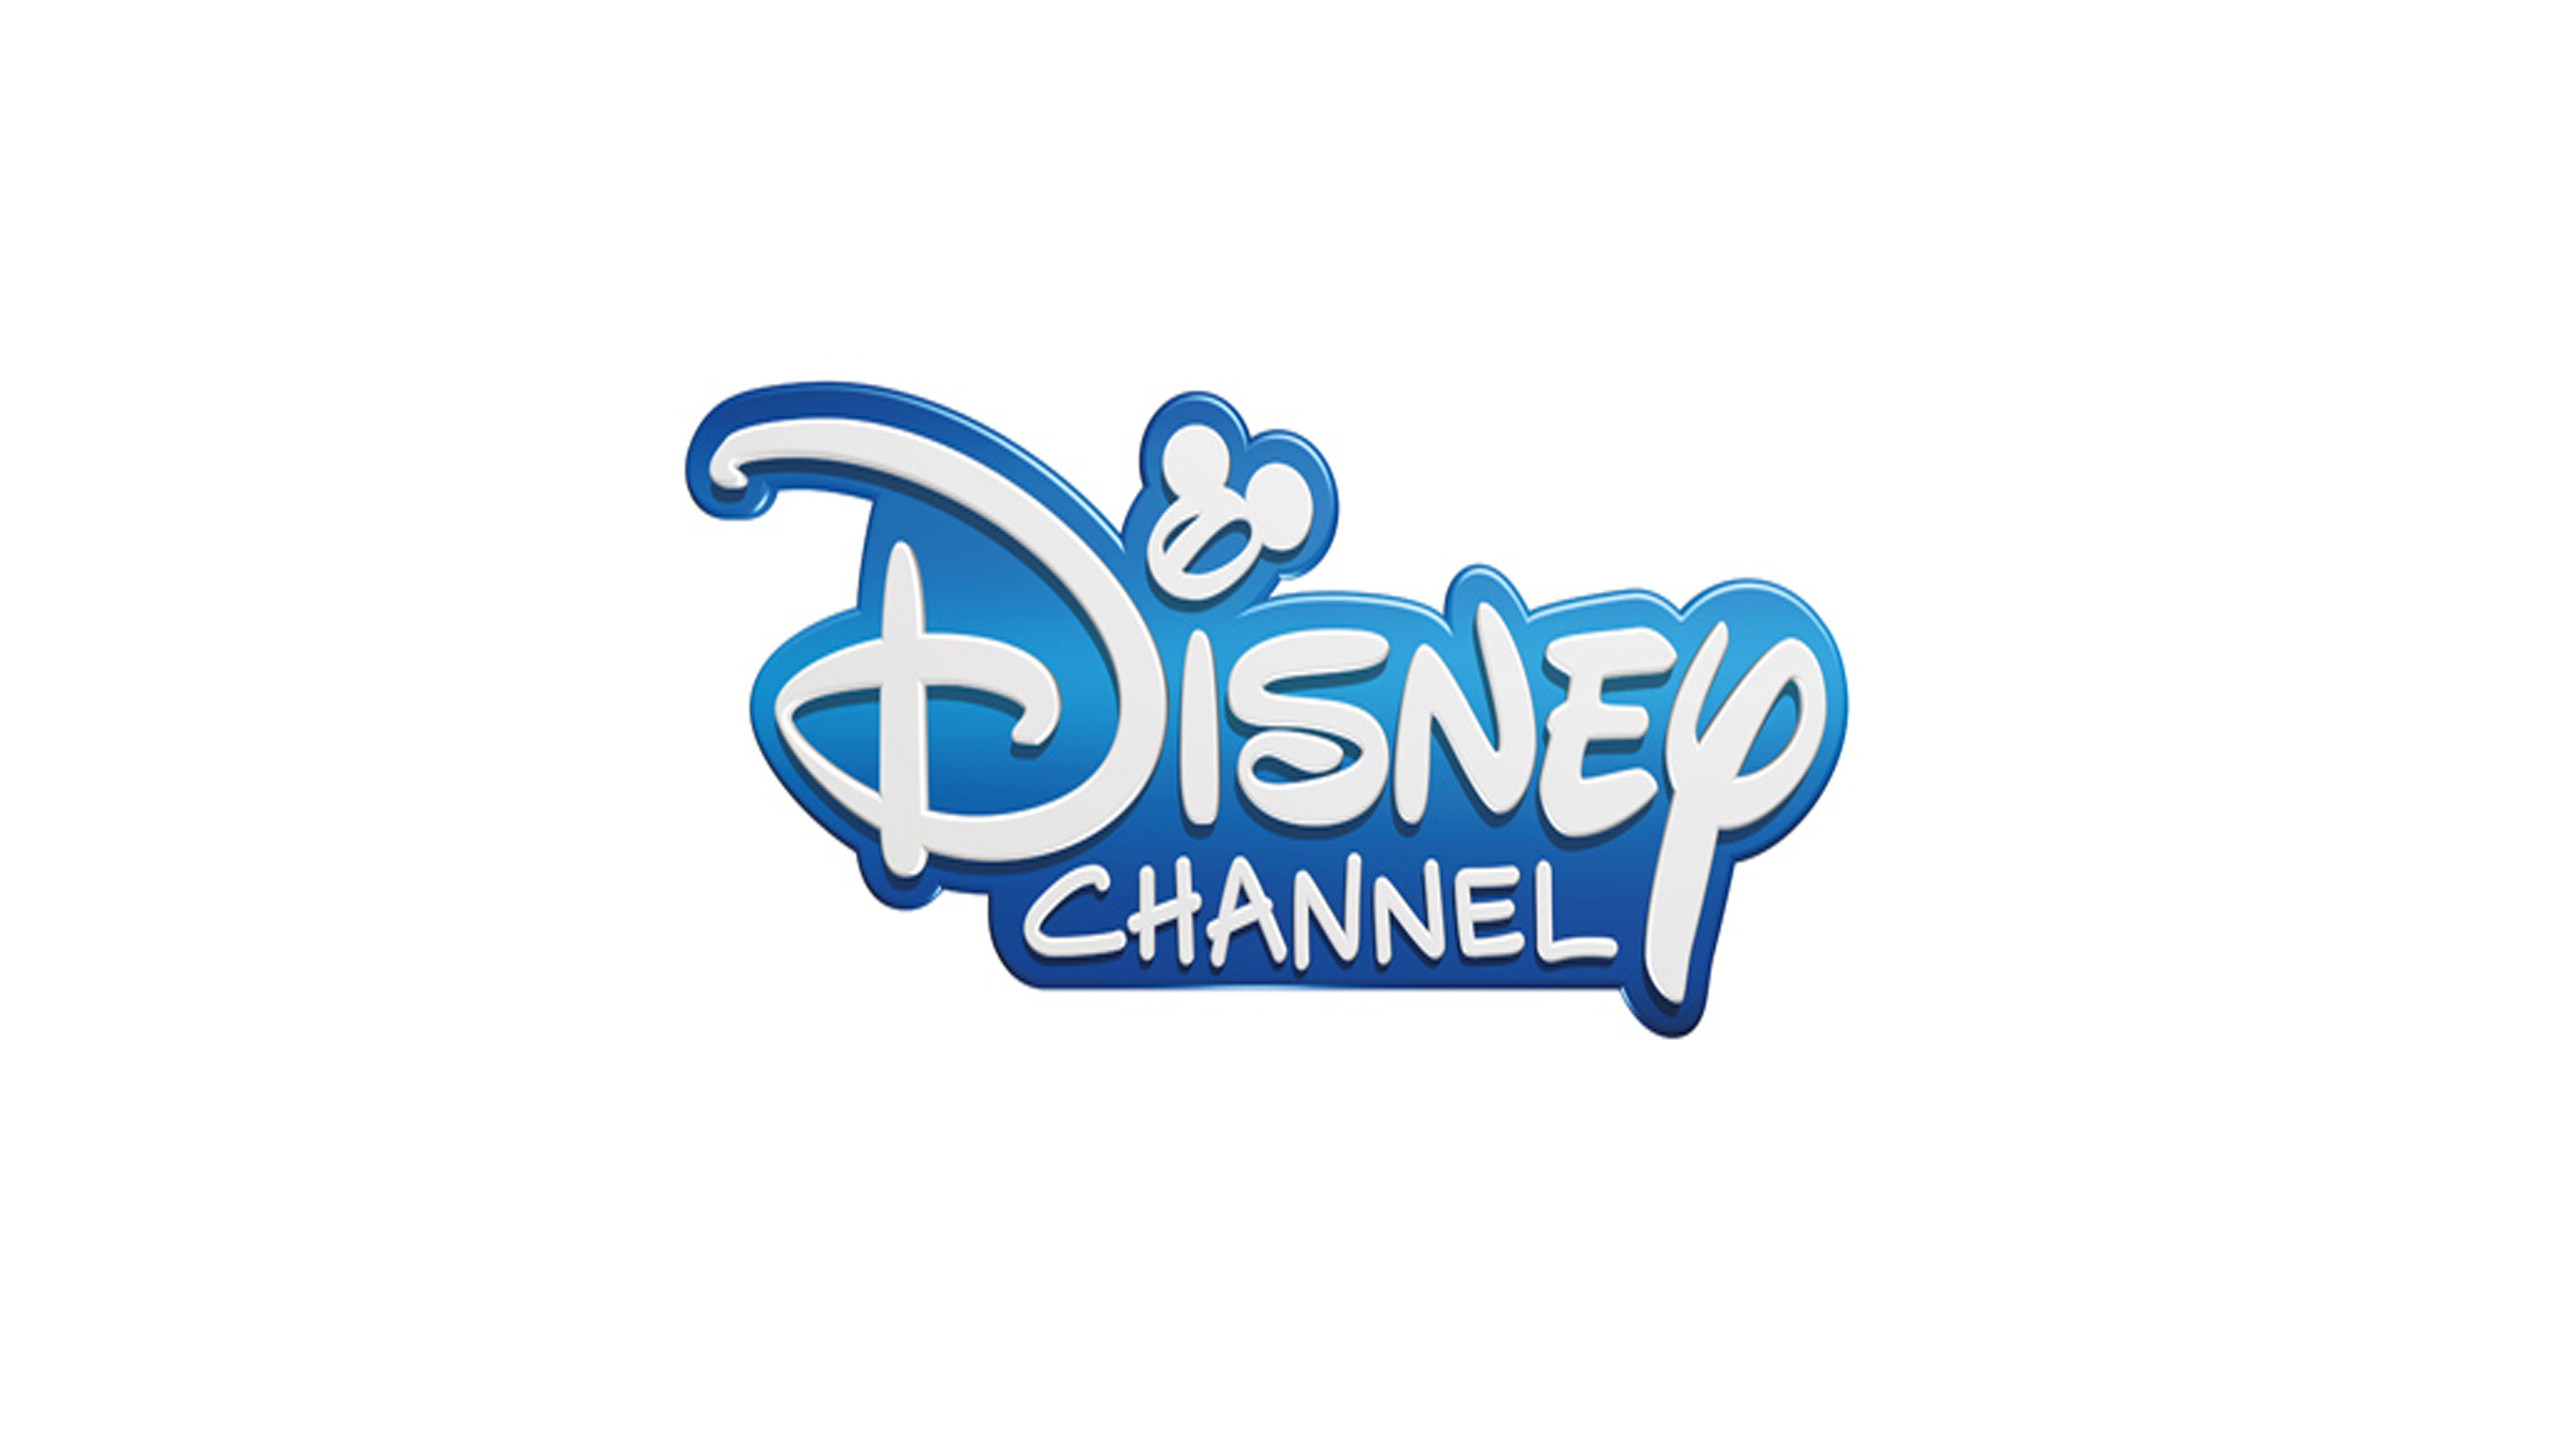 Disney Channel Logo 3